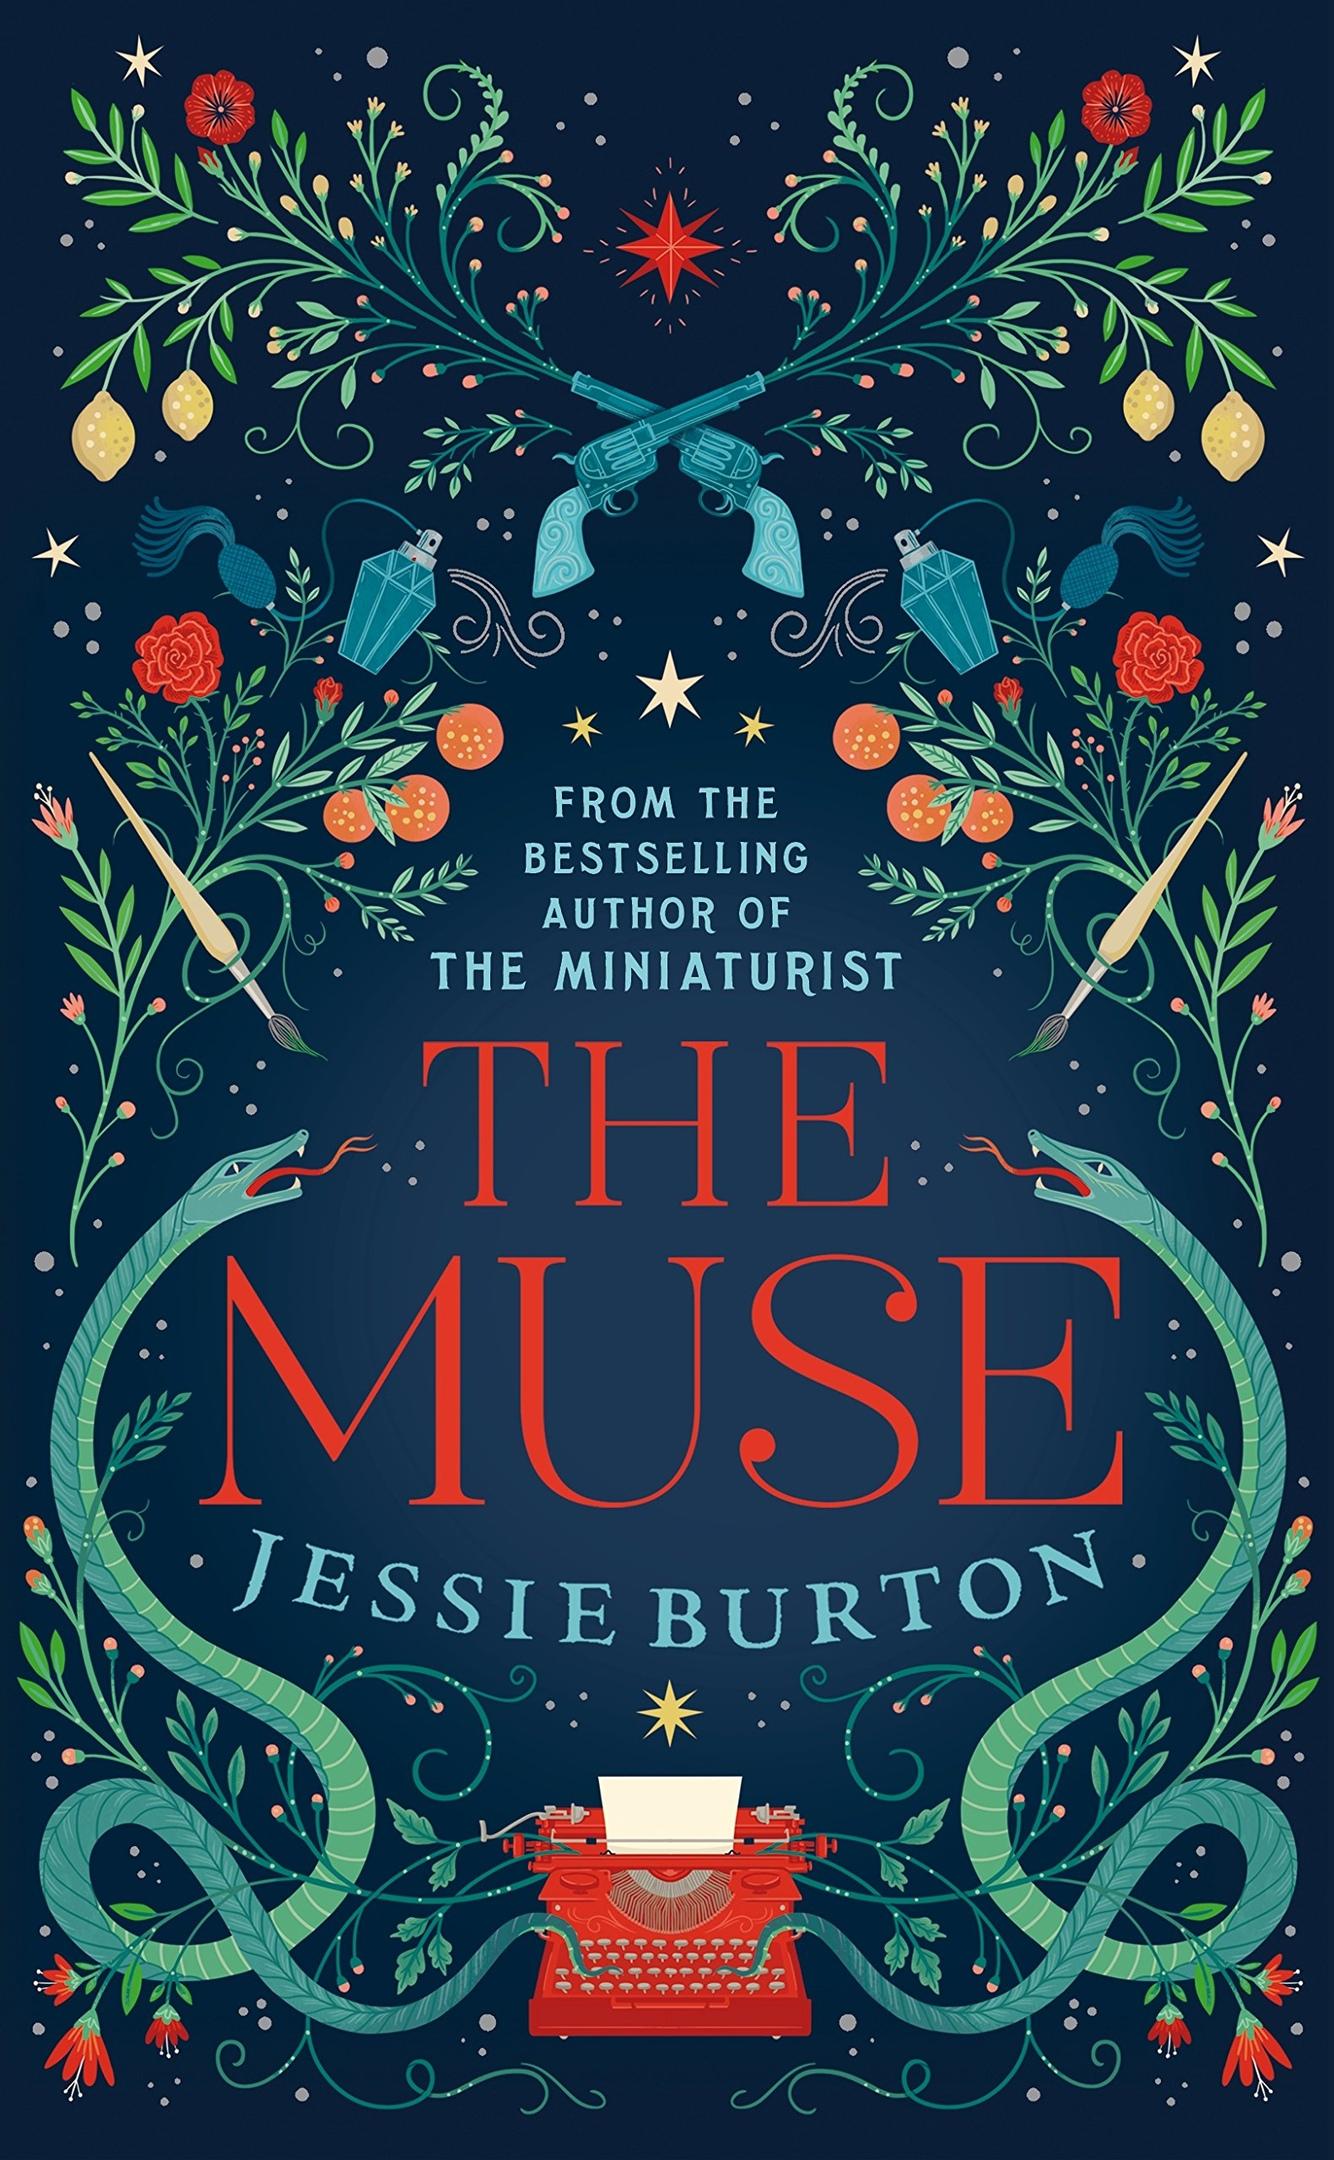 Jessie Burton – The Muse